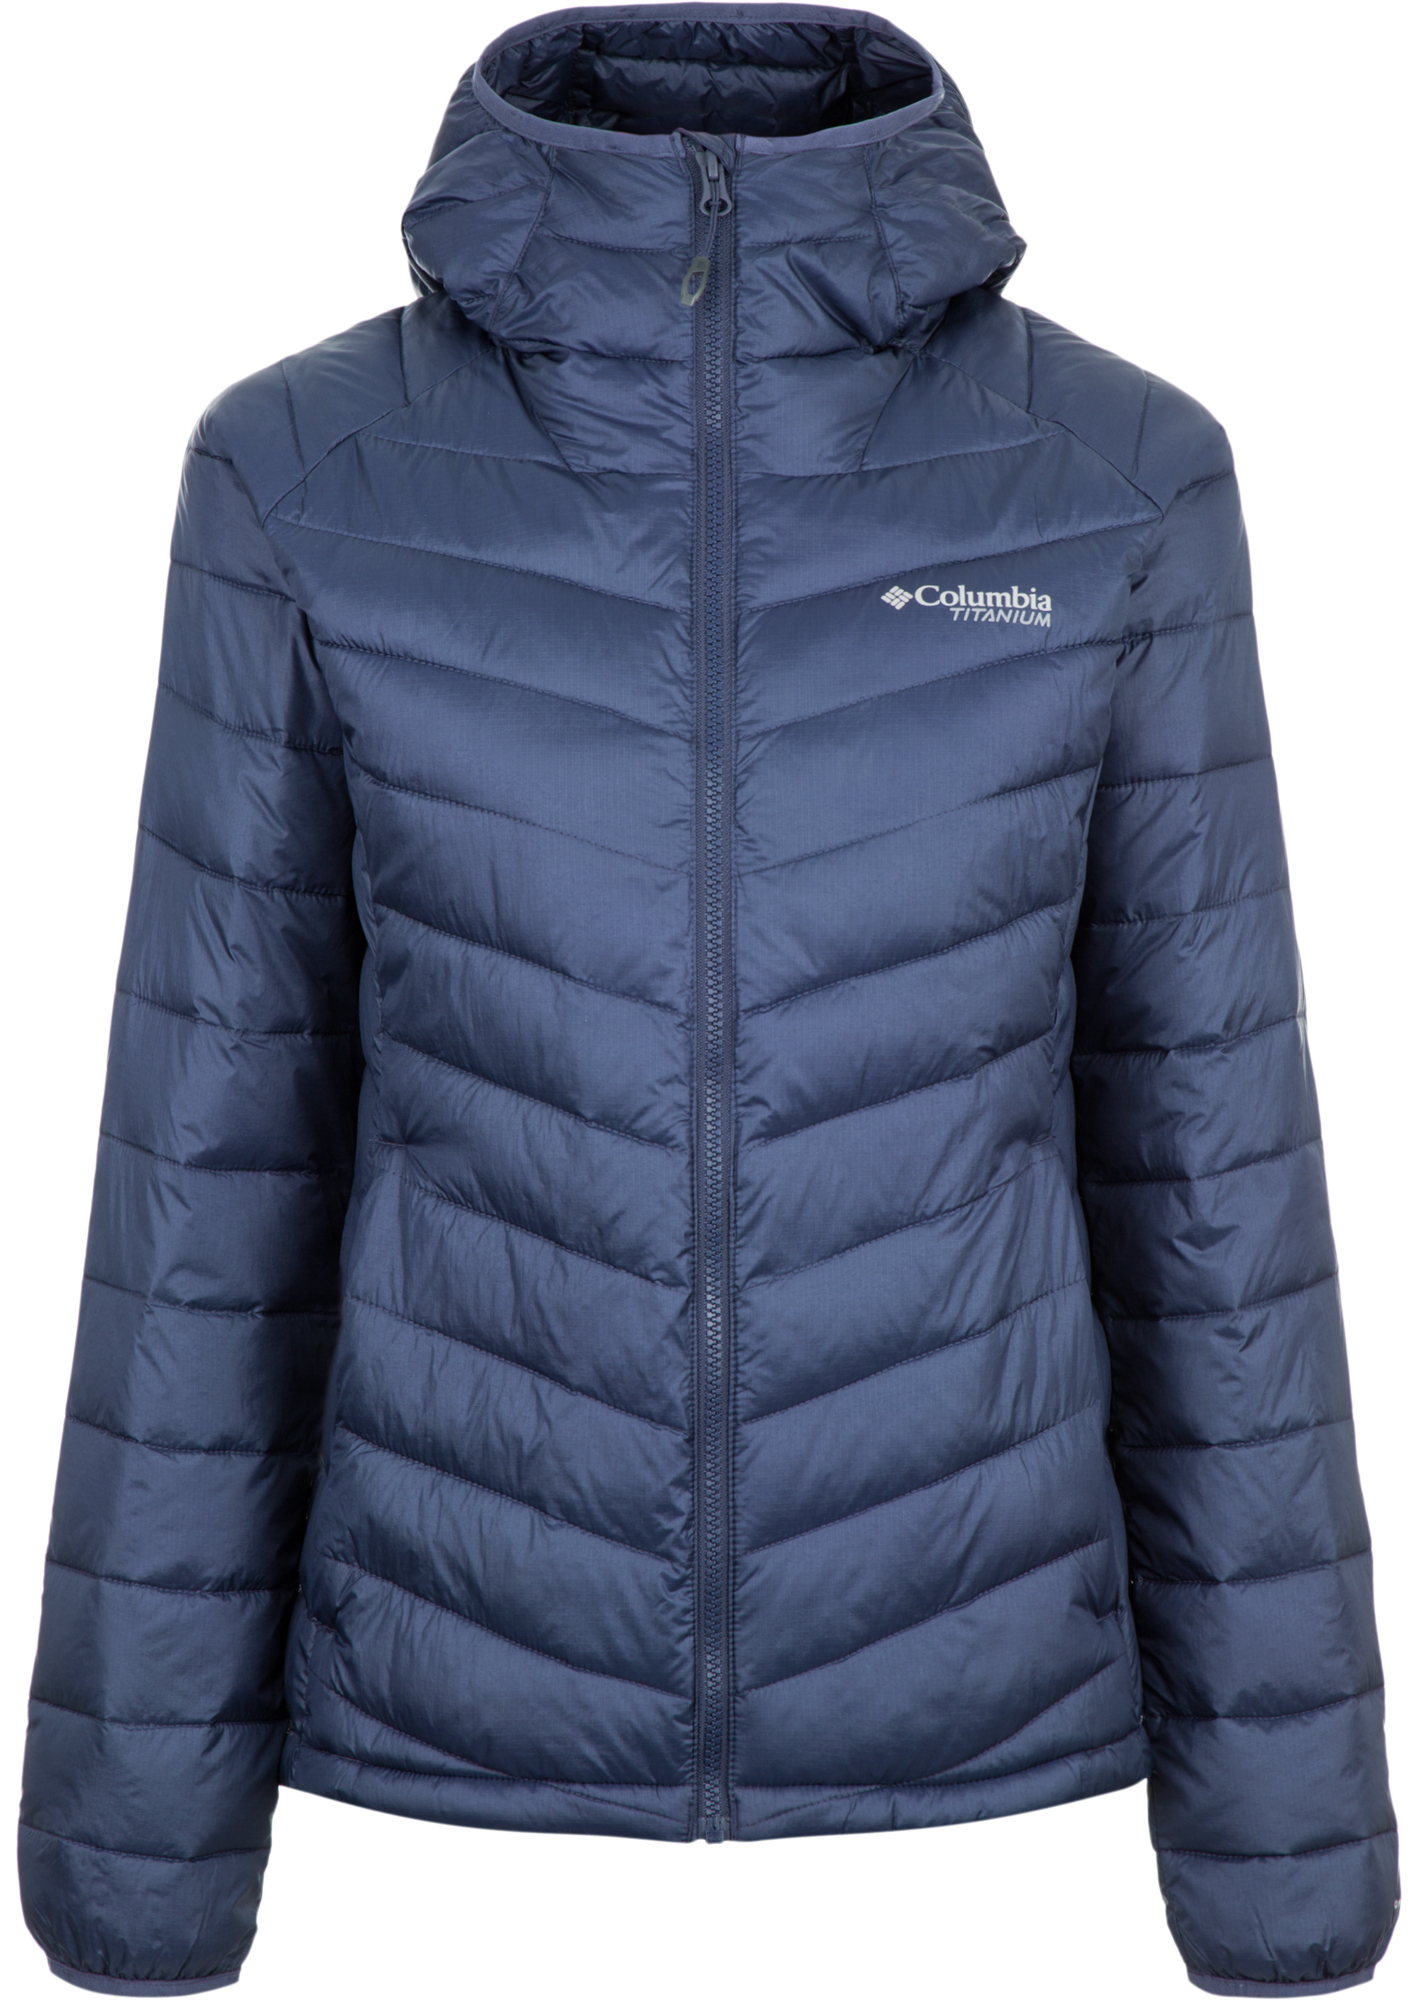 все цены на Columbia Куртка утепленная женская Columbia Snow Country, размер 50